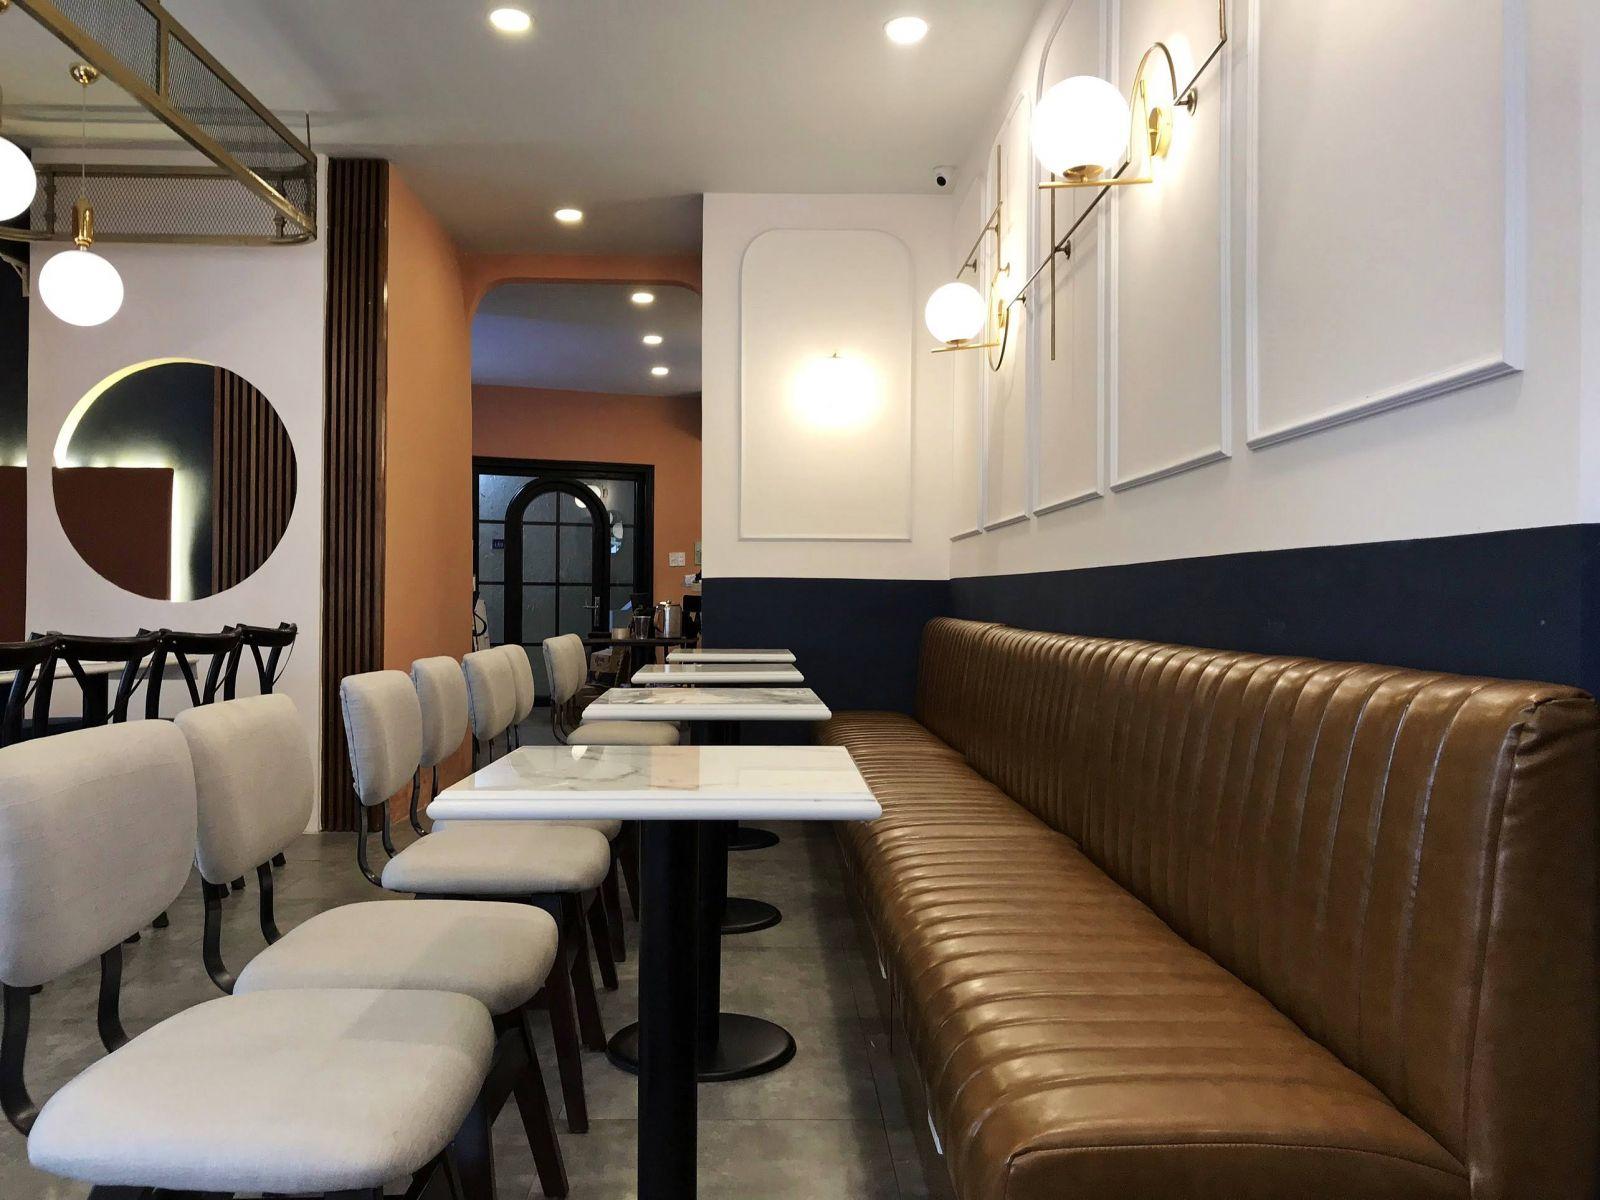 noi-that-Felicite-Coffee&Eatery-42-Tran-Cao-Van-Q3-24